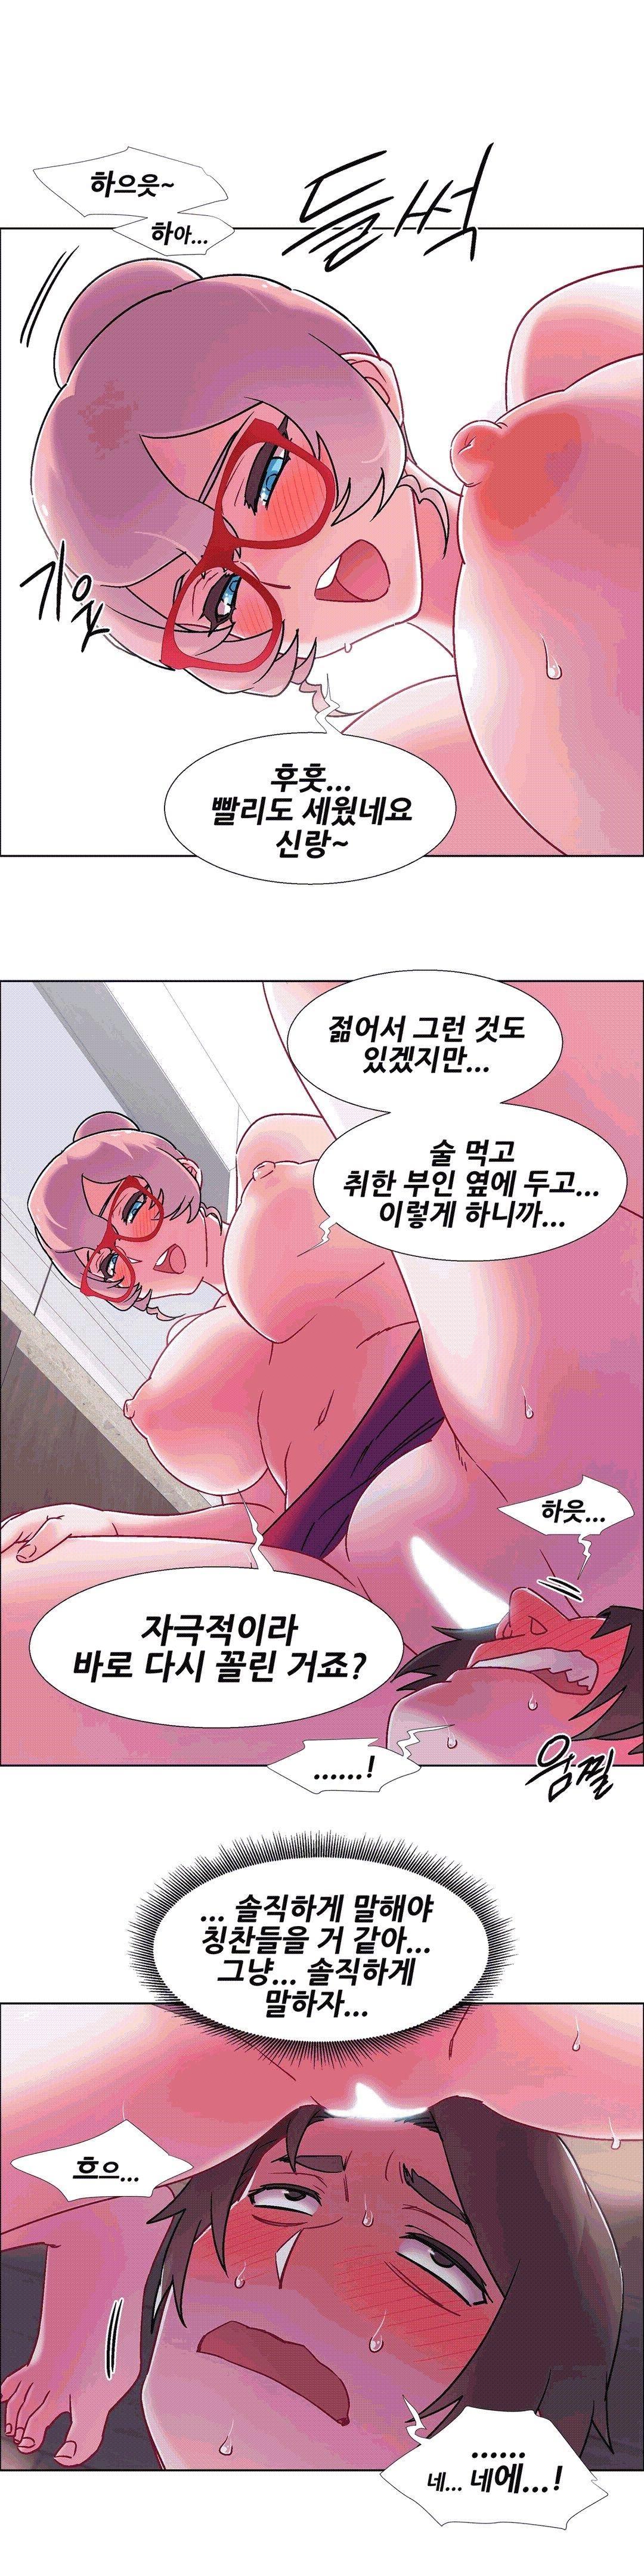 [Studio Wannabe] Rental Girls | 出租女郎 Ch. 33-58 [Chinese]  第二季 完结 620